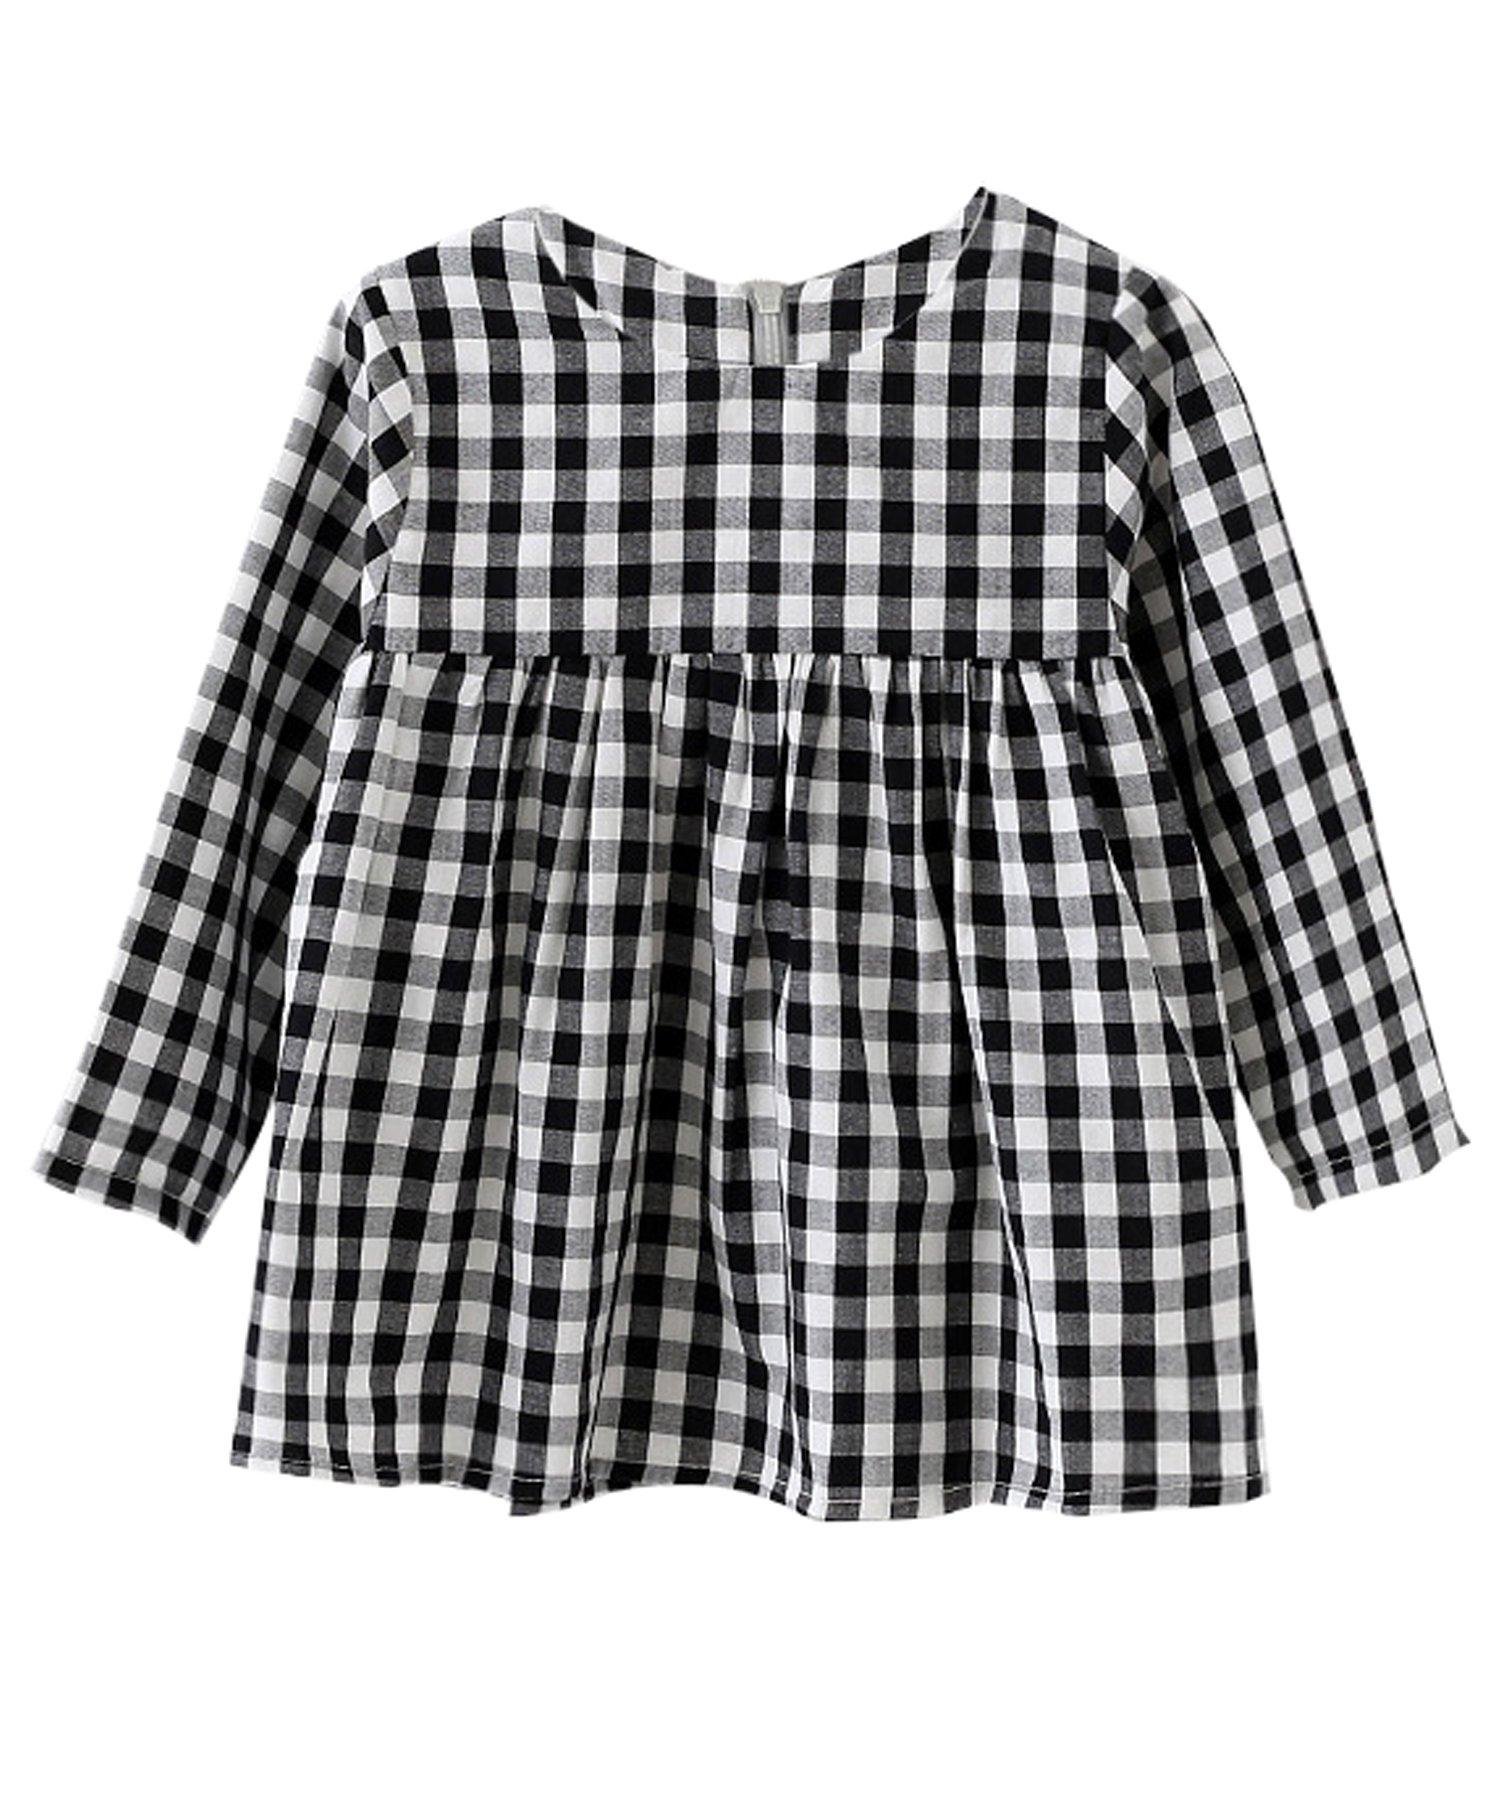 Little Girls High Waist Plaid Dress Black White Long Sleeve Spring Fall Playwear Size 110 (4T) Black Plaid